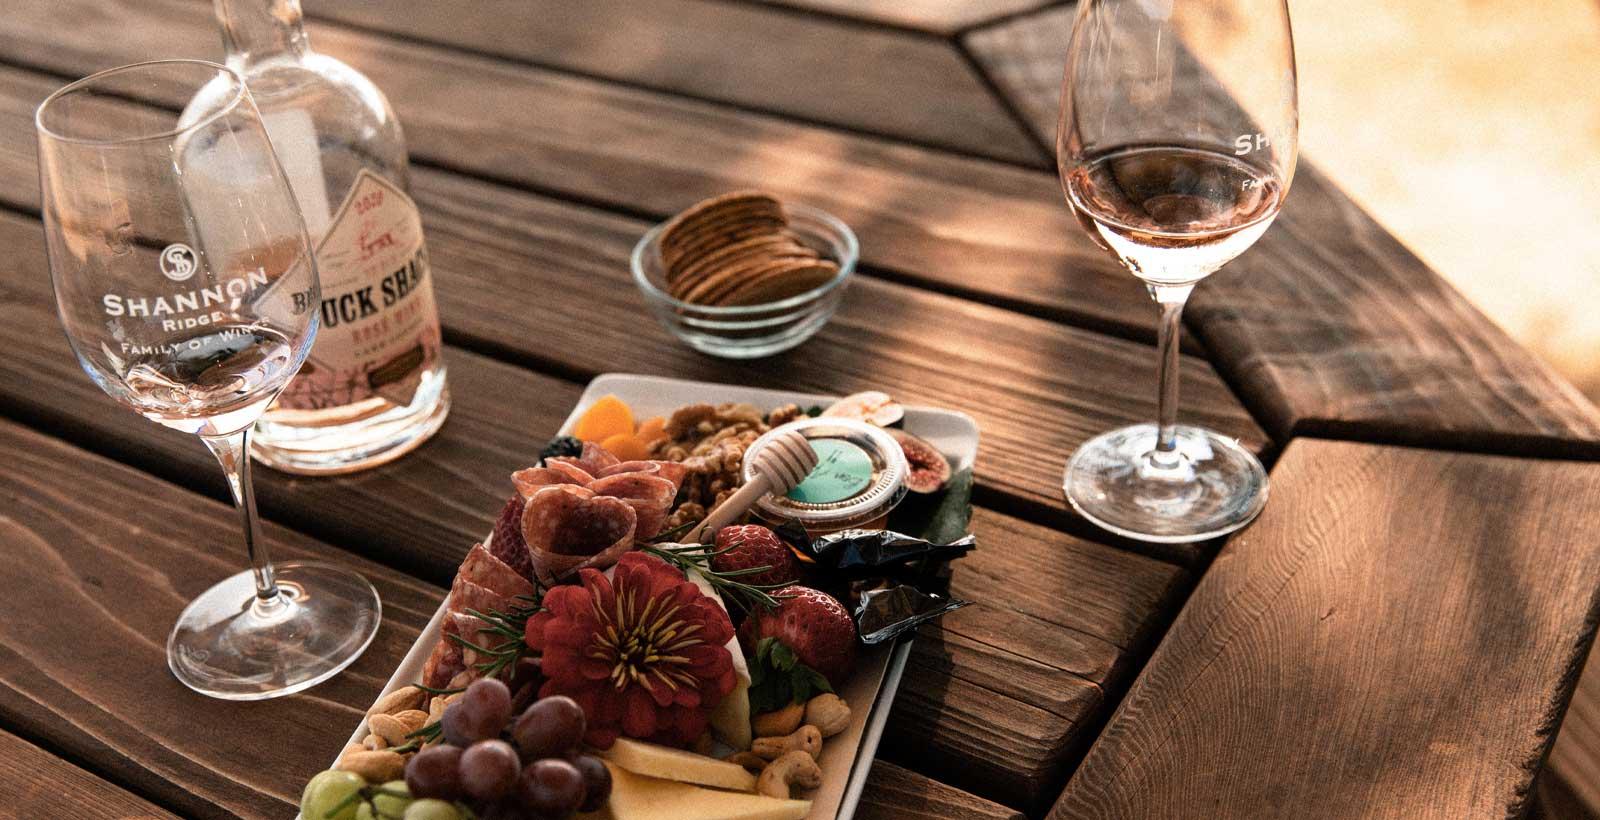 Shannon Ridge Wine Club